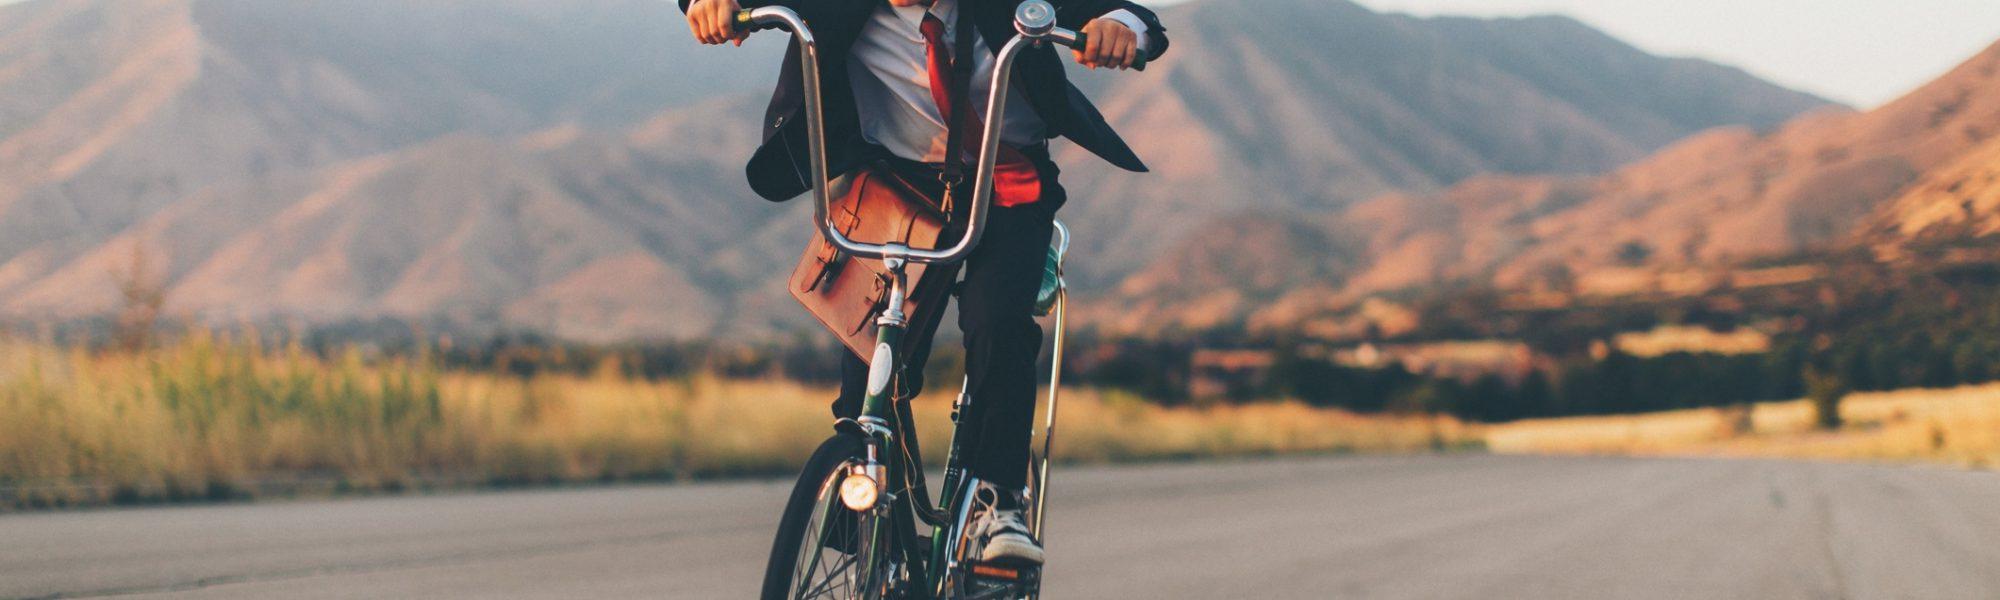 Boy with Bike 5472332afa344033d2bf9e7b6b9d883e